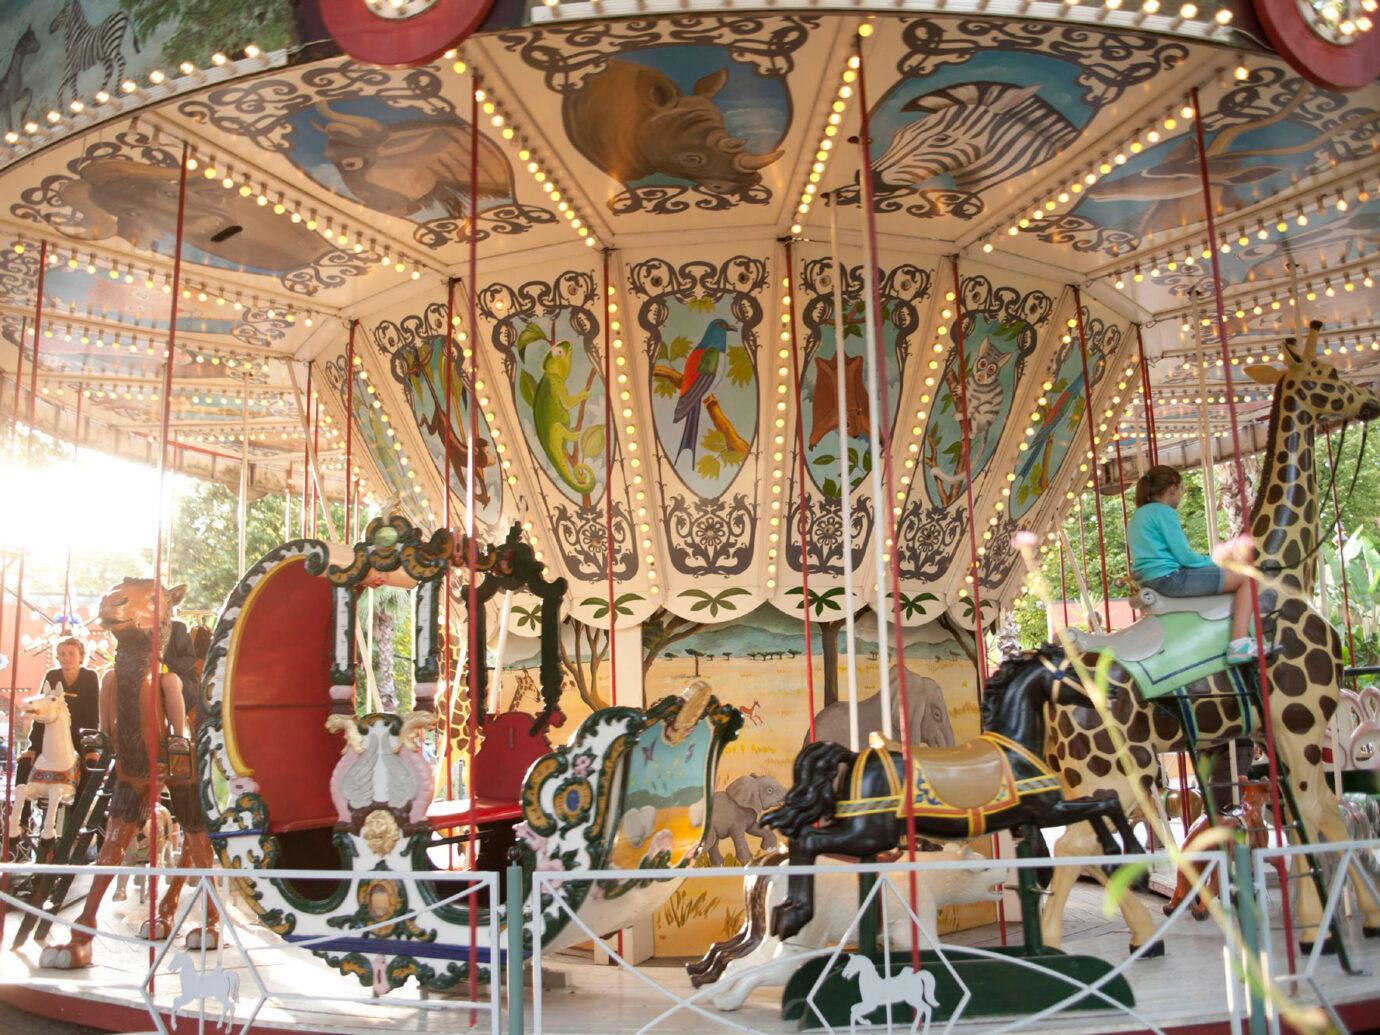 carousel at Tivoli Gardens, Copenhagen, Denmark